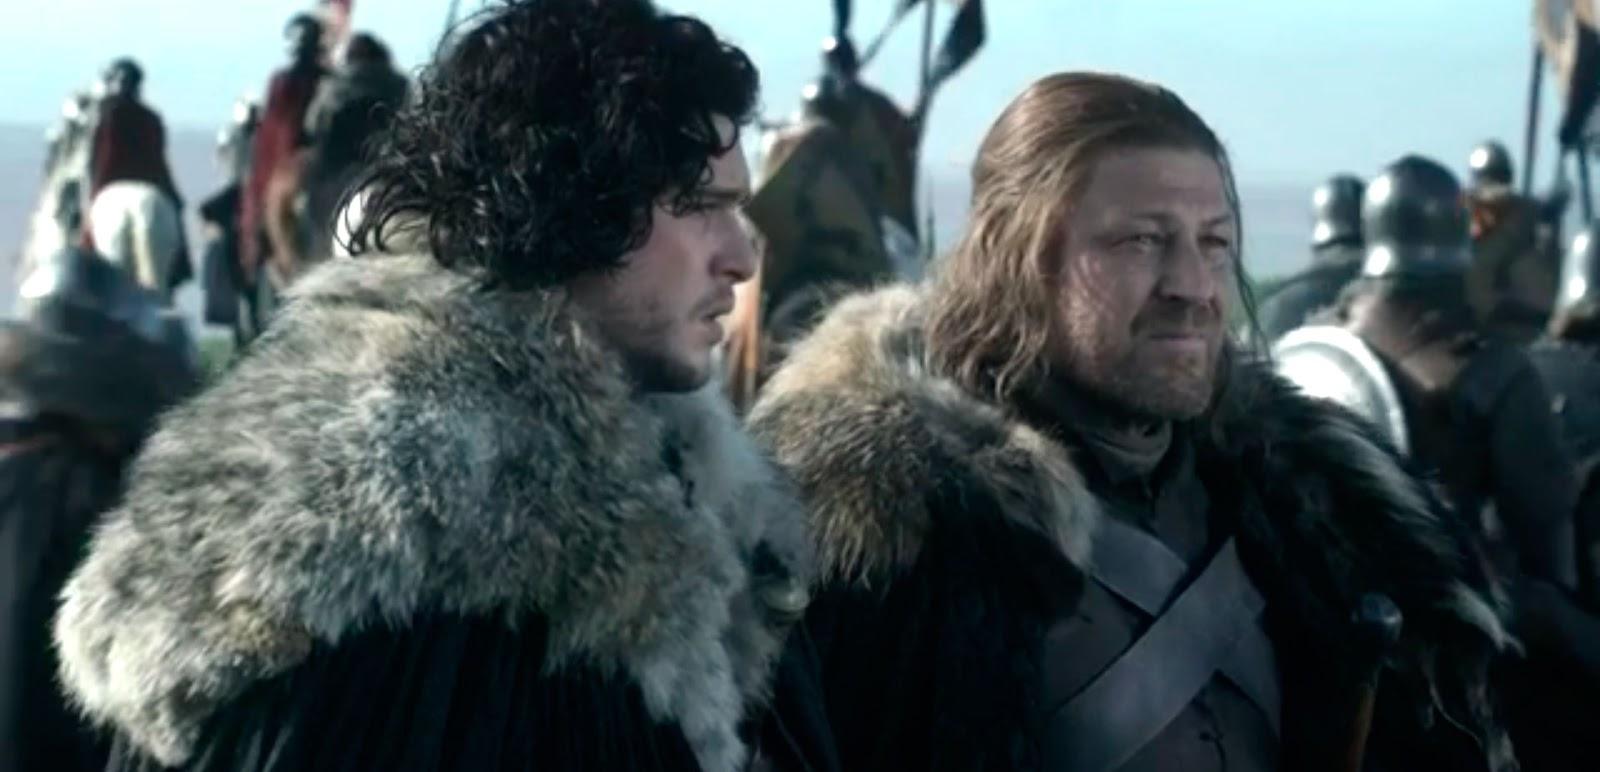 Jon Ned Game of Thrones